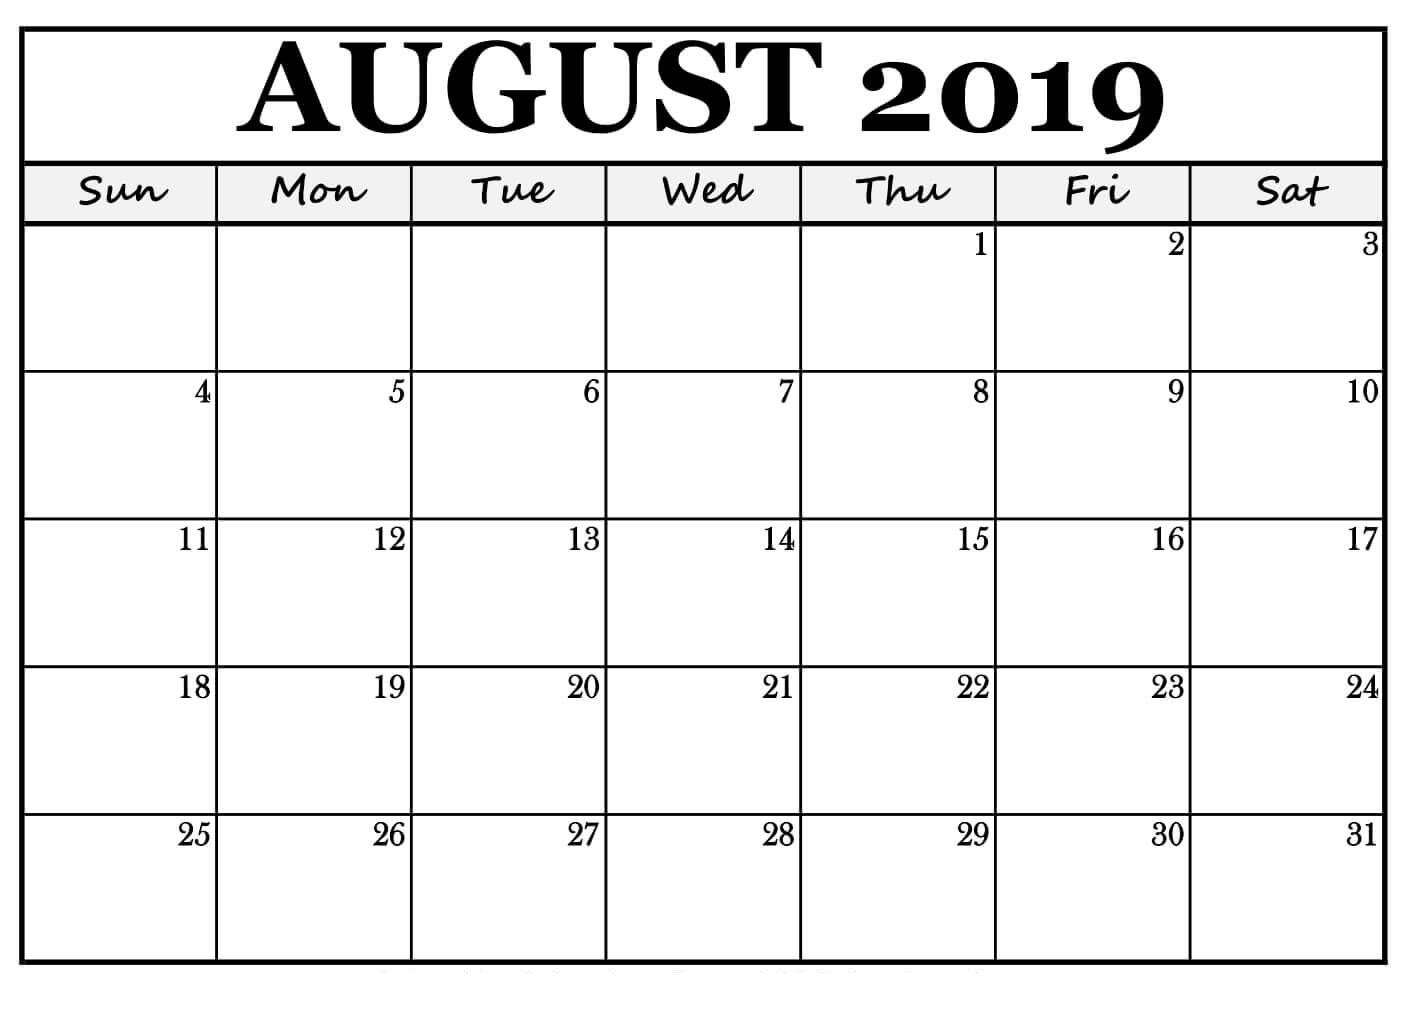 Free Printable August 2019 Calendar Landscape - Free Printable in Pretty Blank Augst Calender